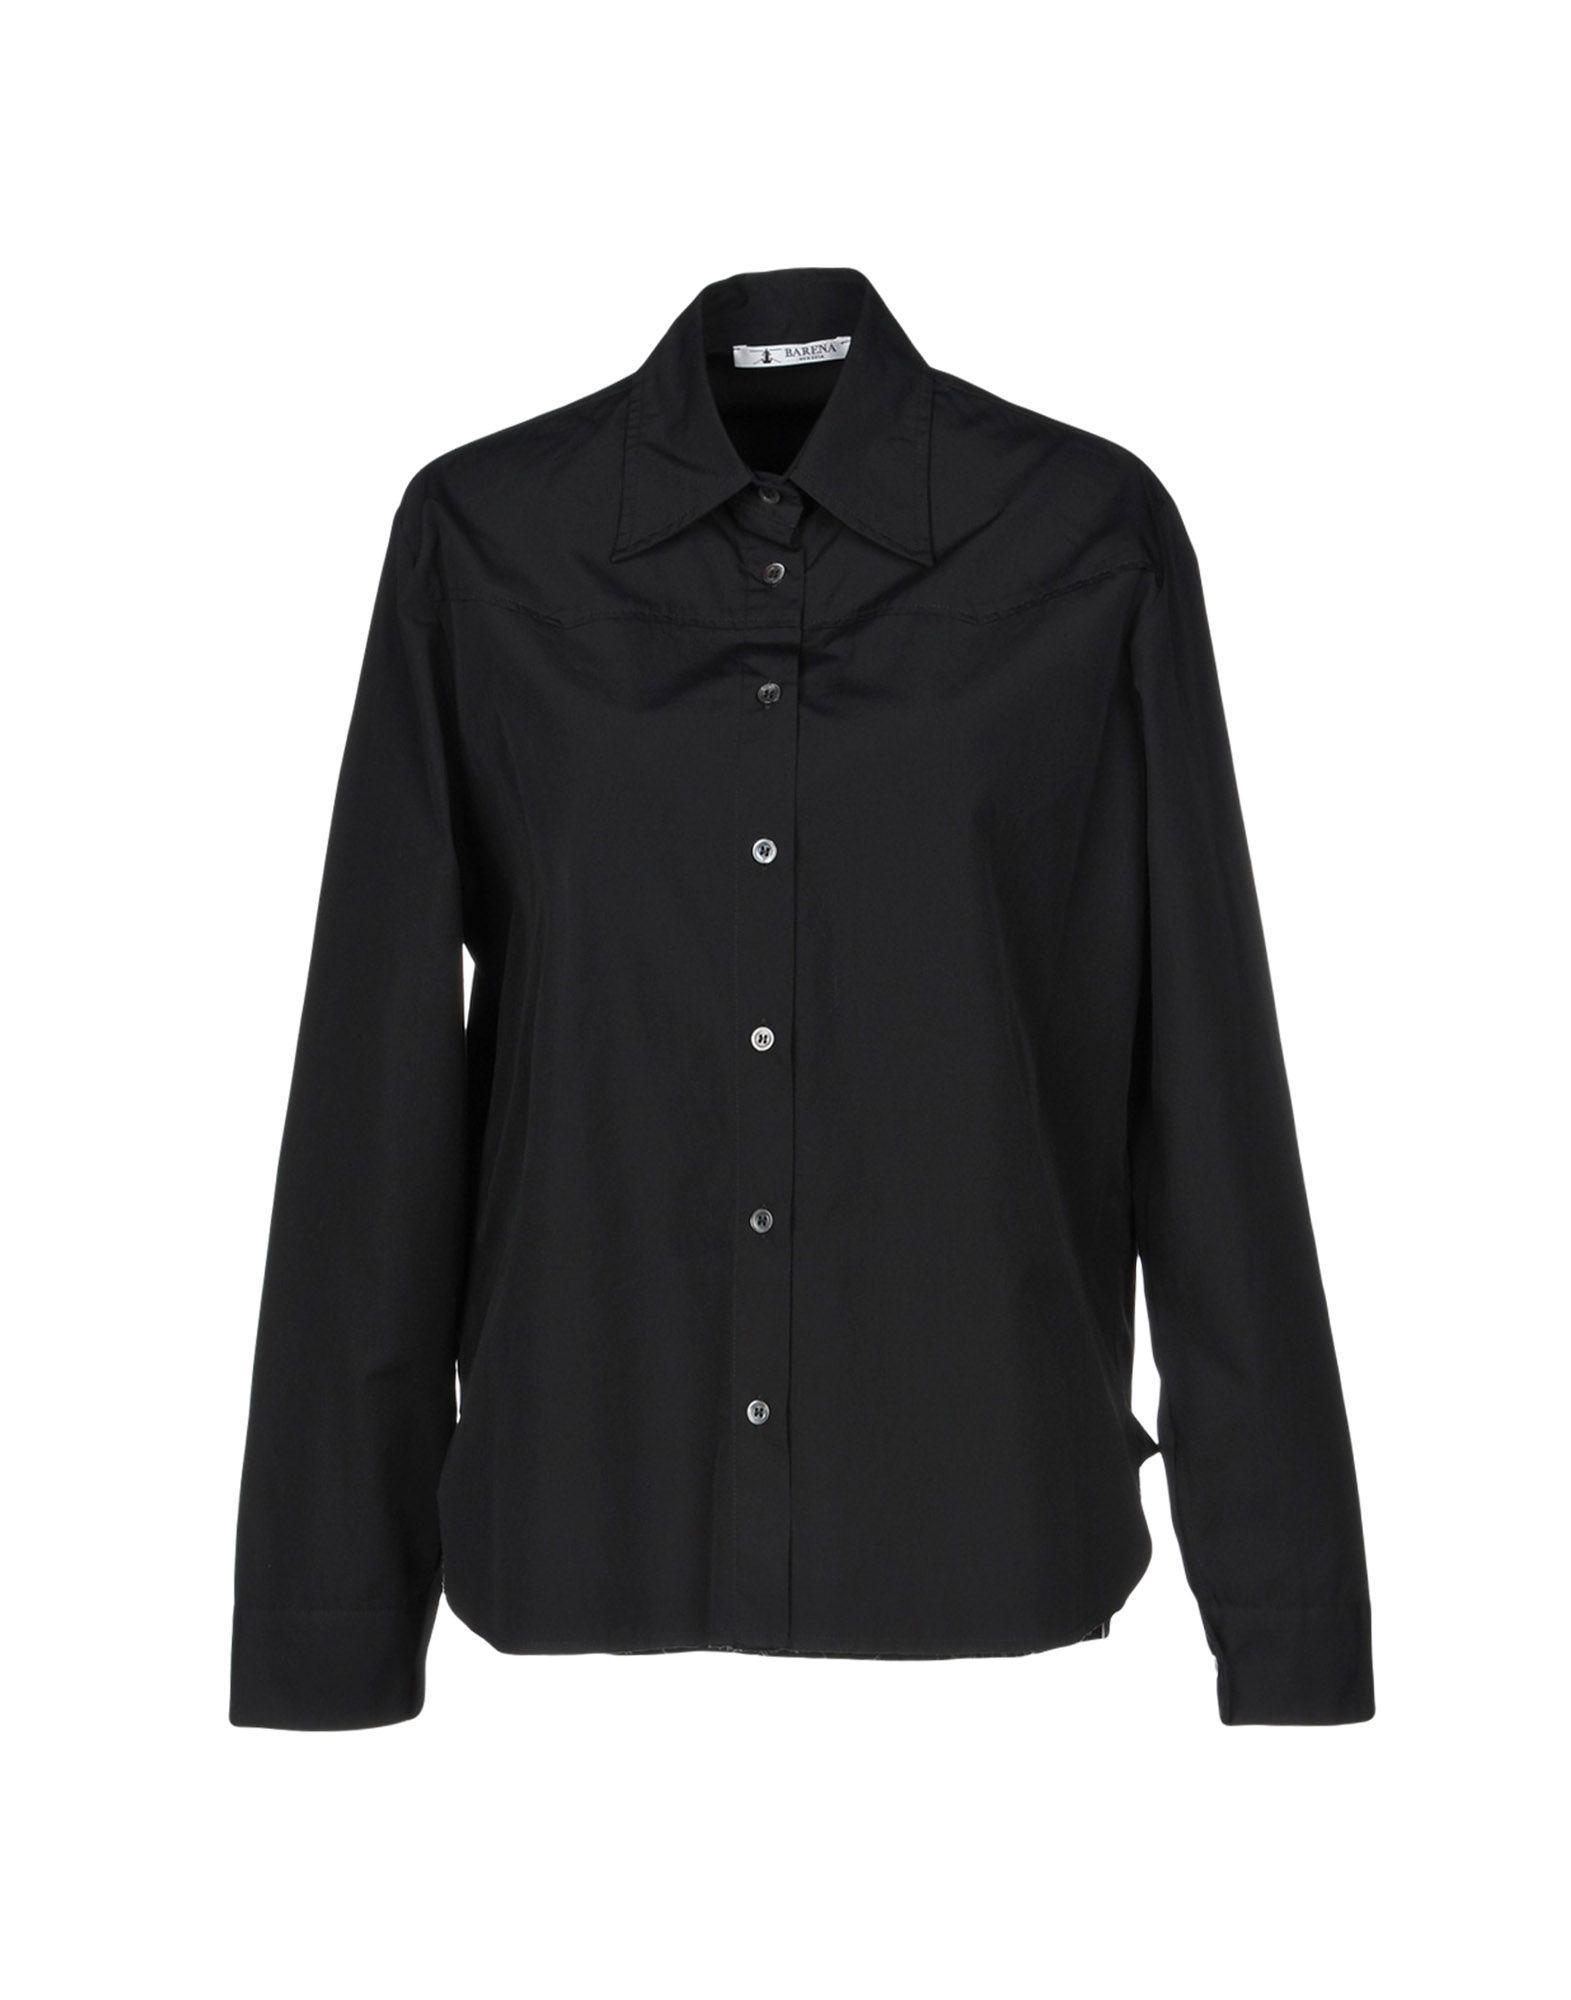 Barena Venezia Solid Color Shirts & Blouses In Black